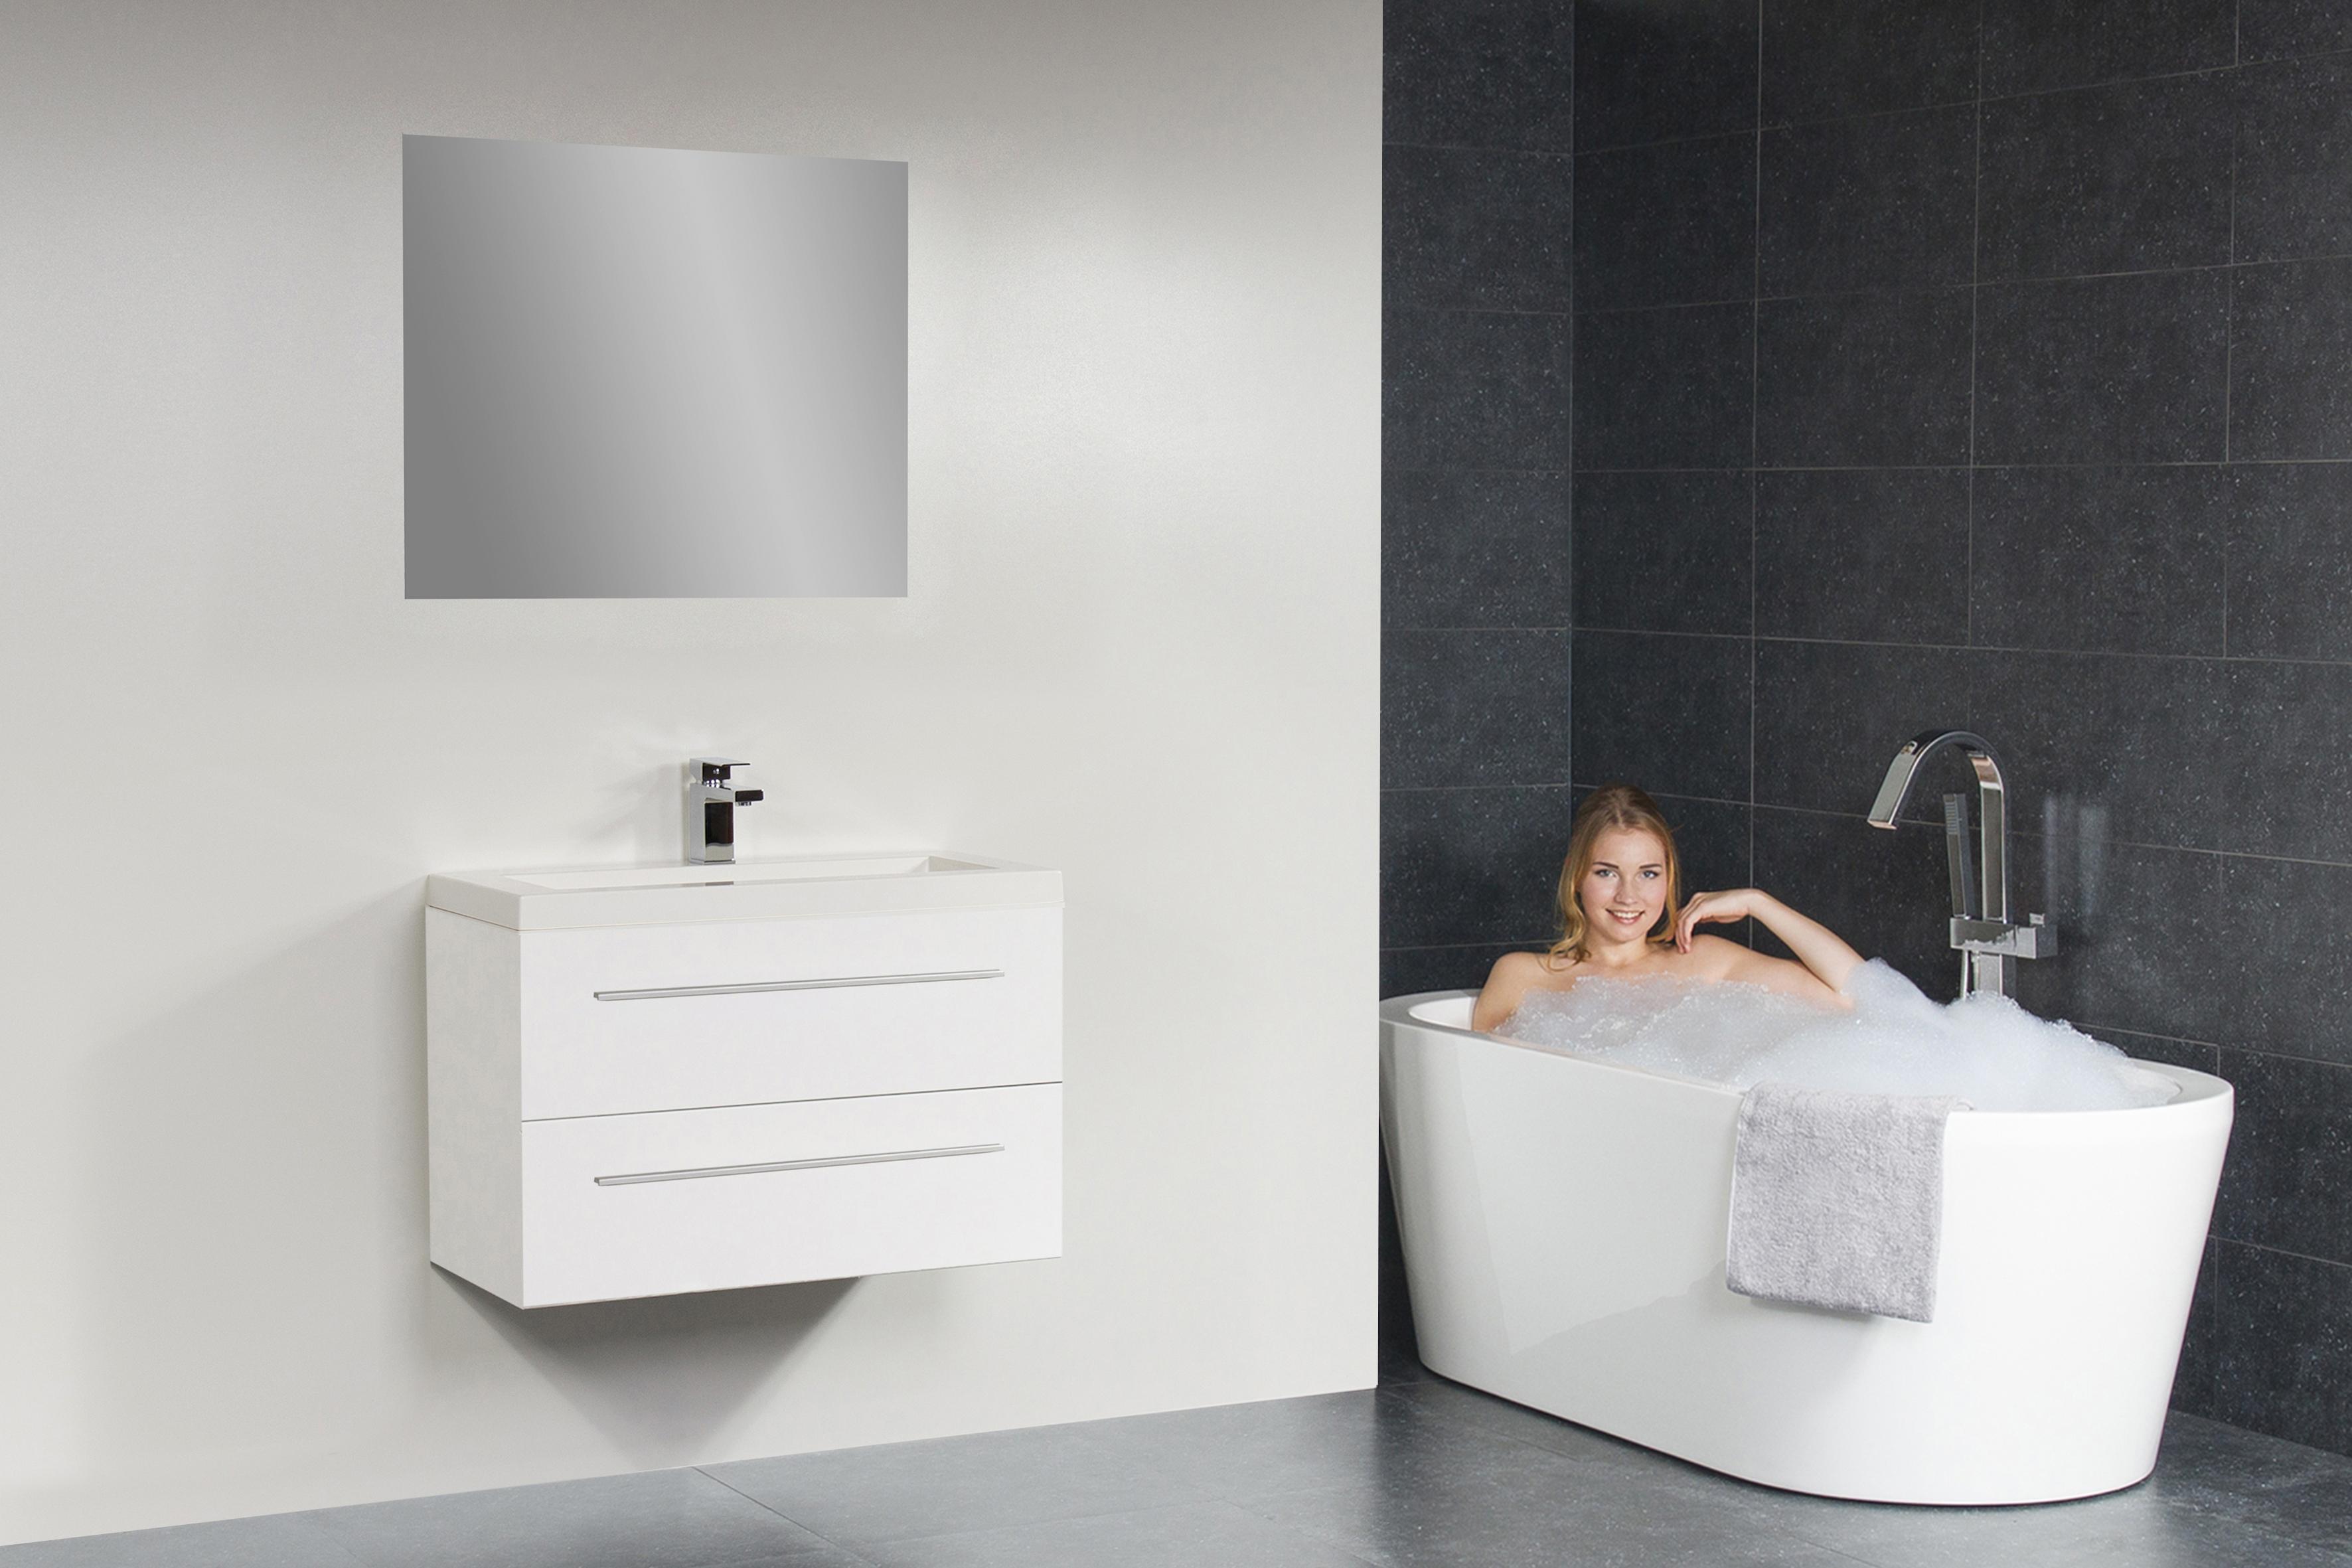 Sub 102 badmeubel met blad met hoge kast met spiegelkast 80 cm wit